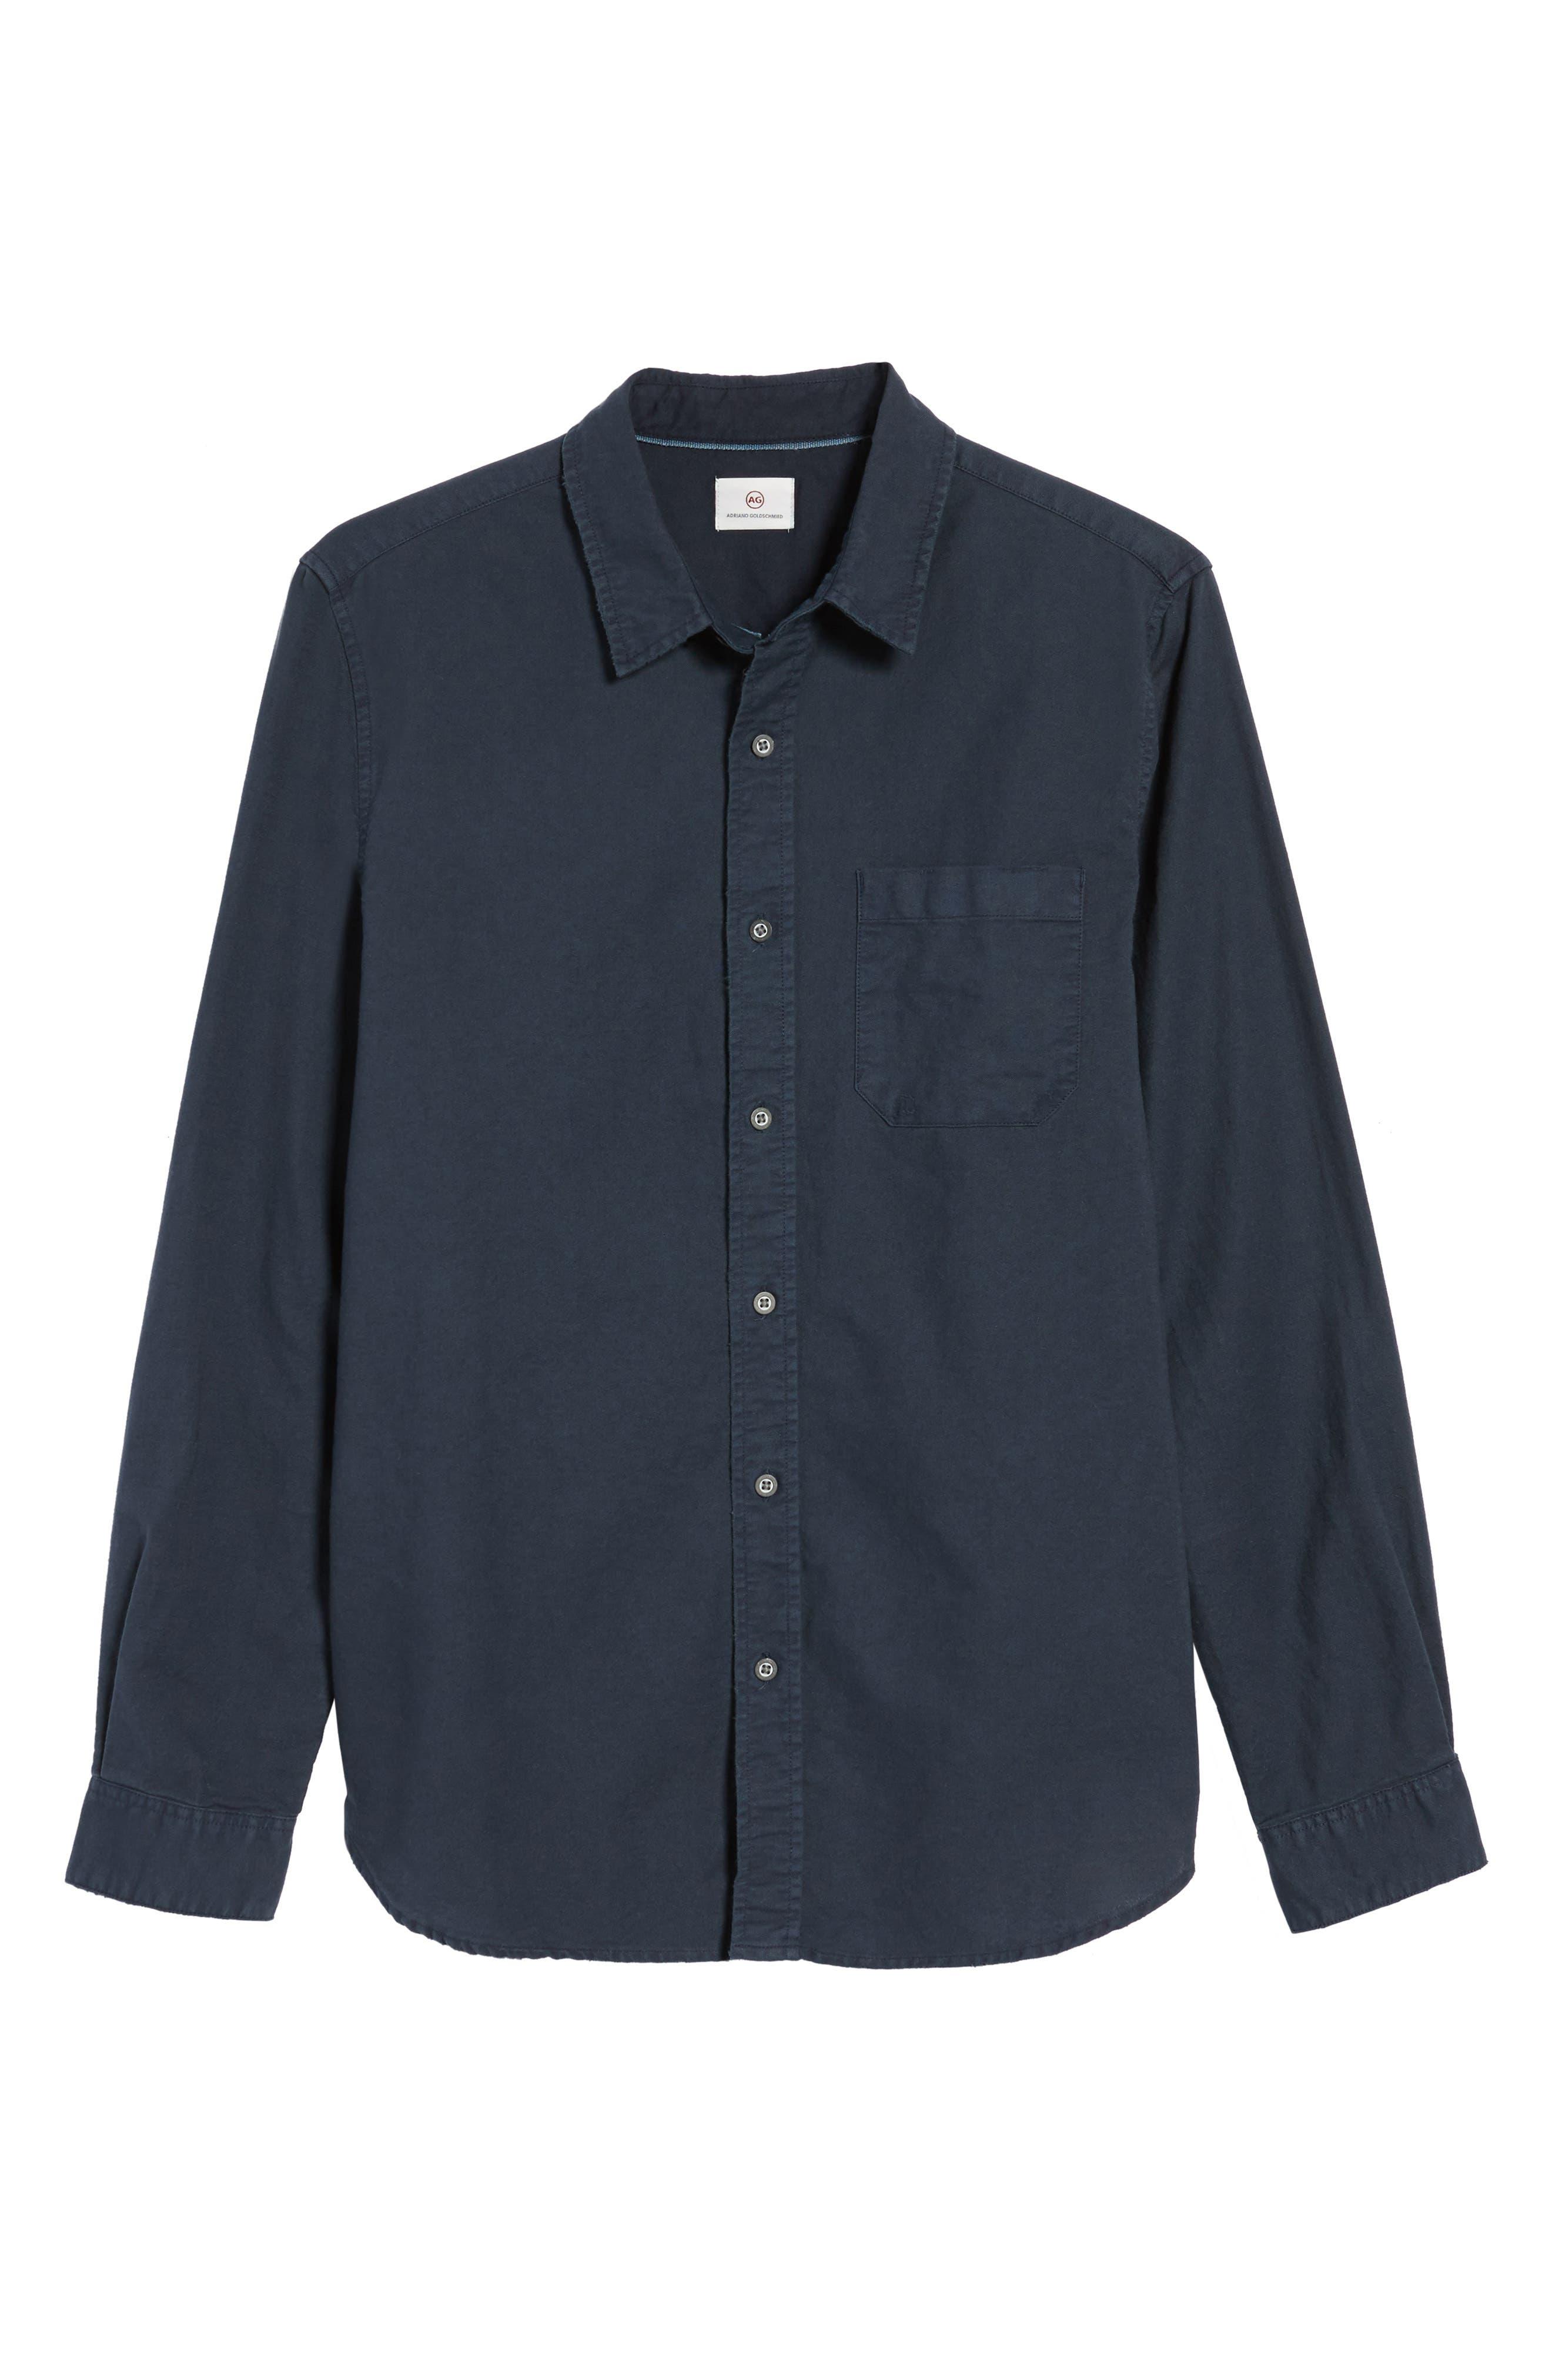 Caleb Slim Fit Twill Sport Shirt,                             Alternate thumbnail 12, color,